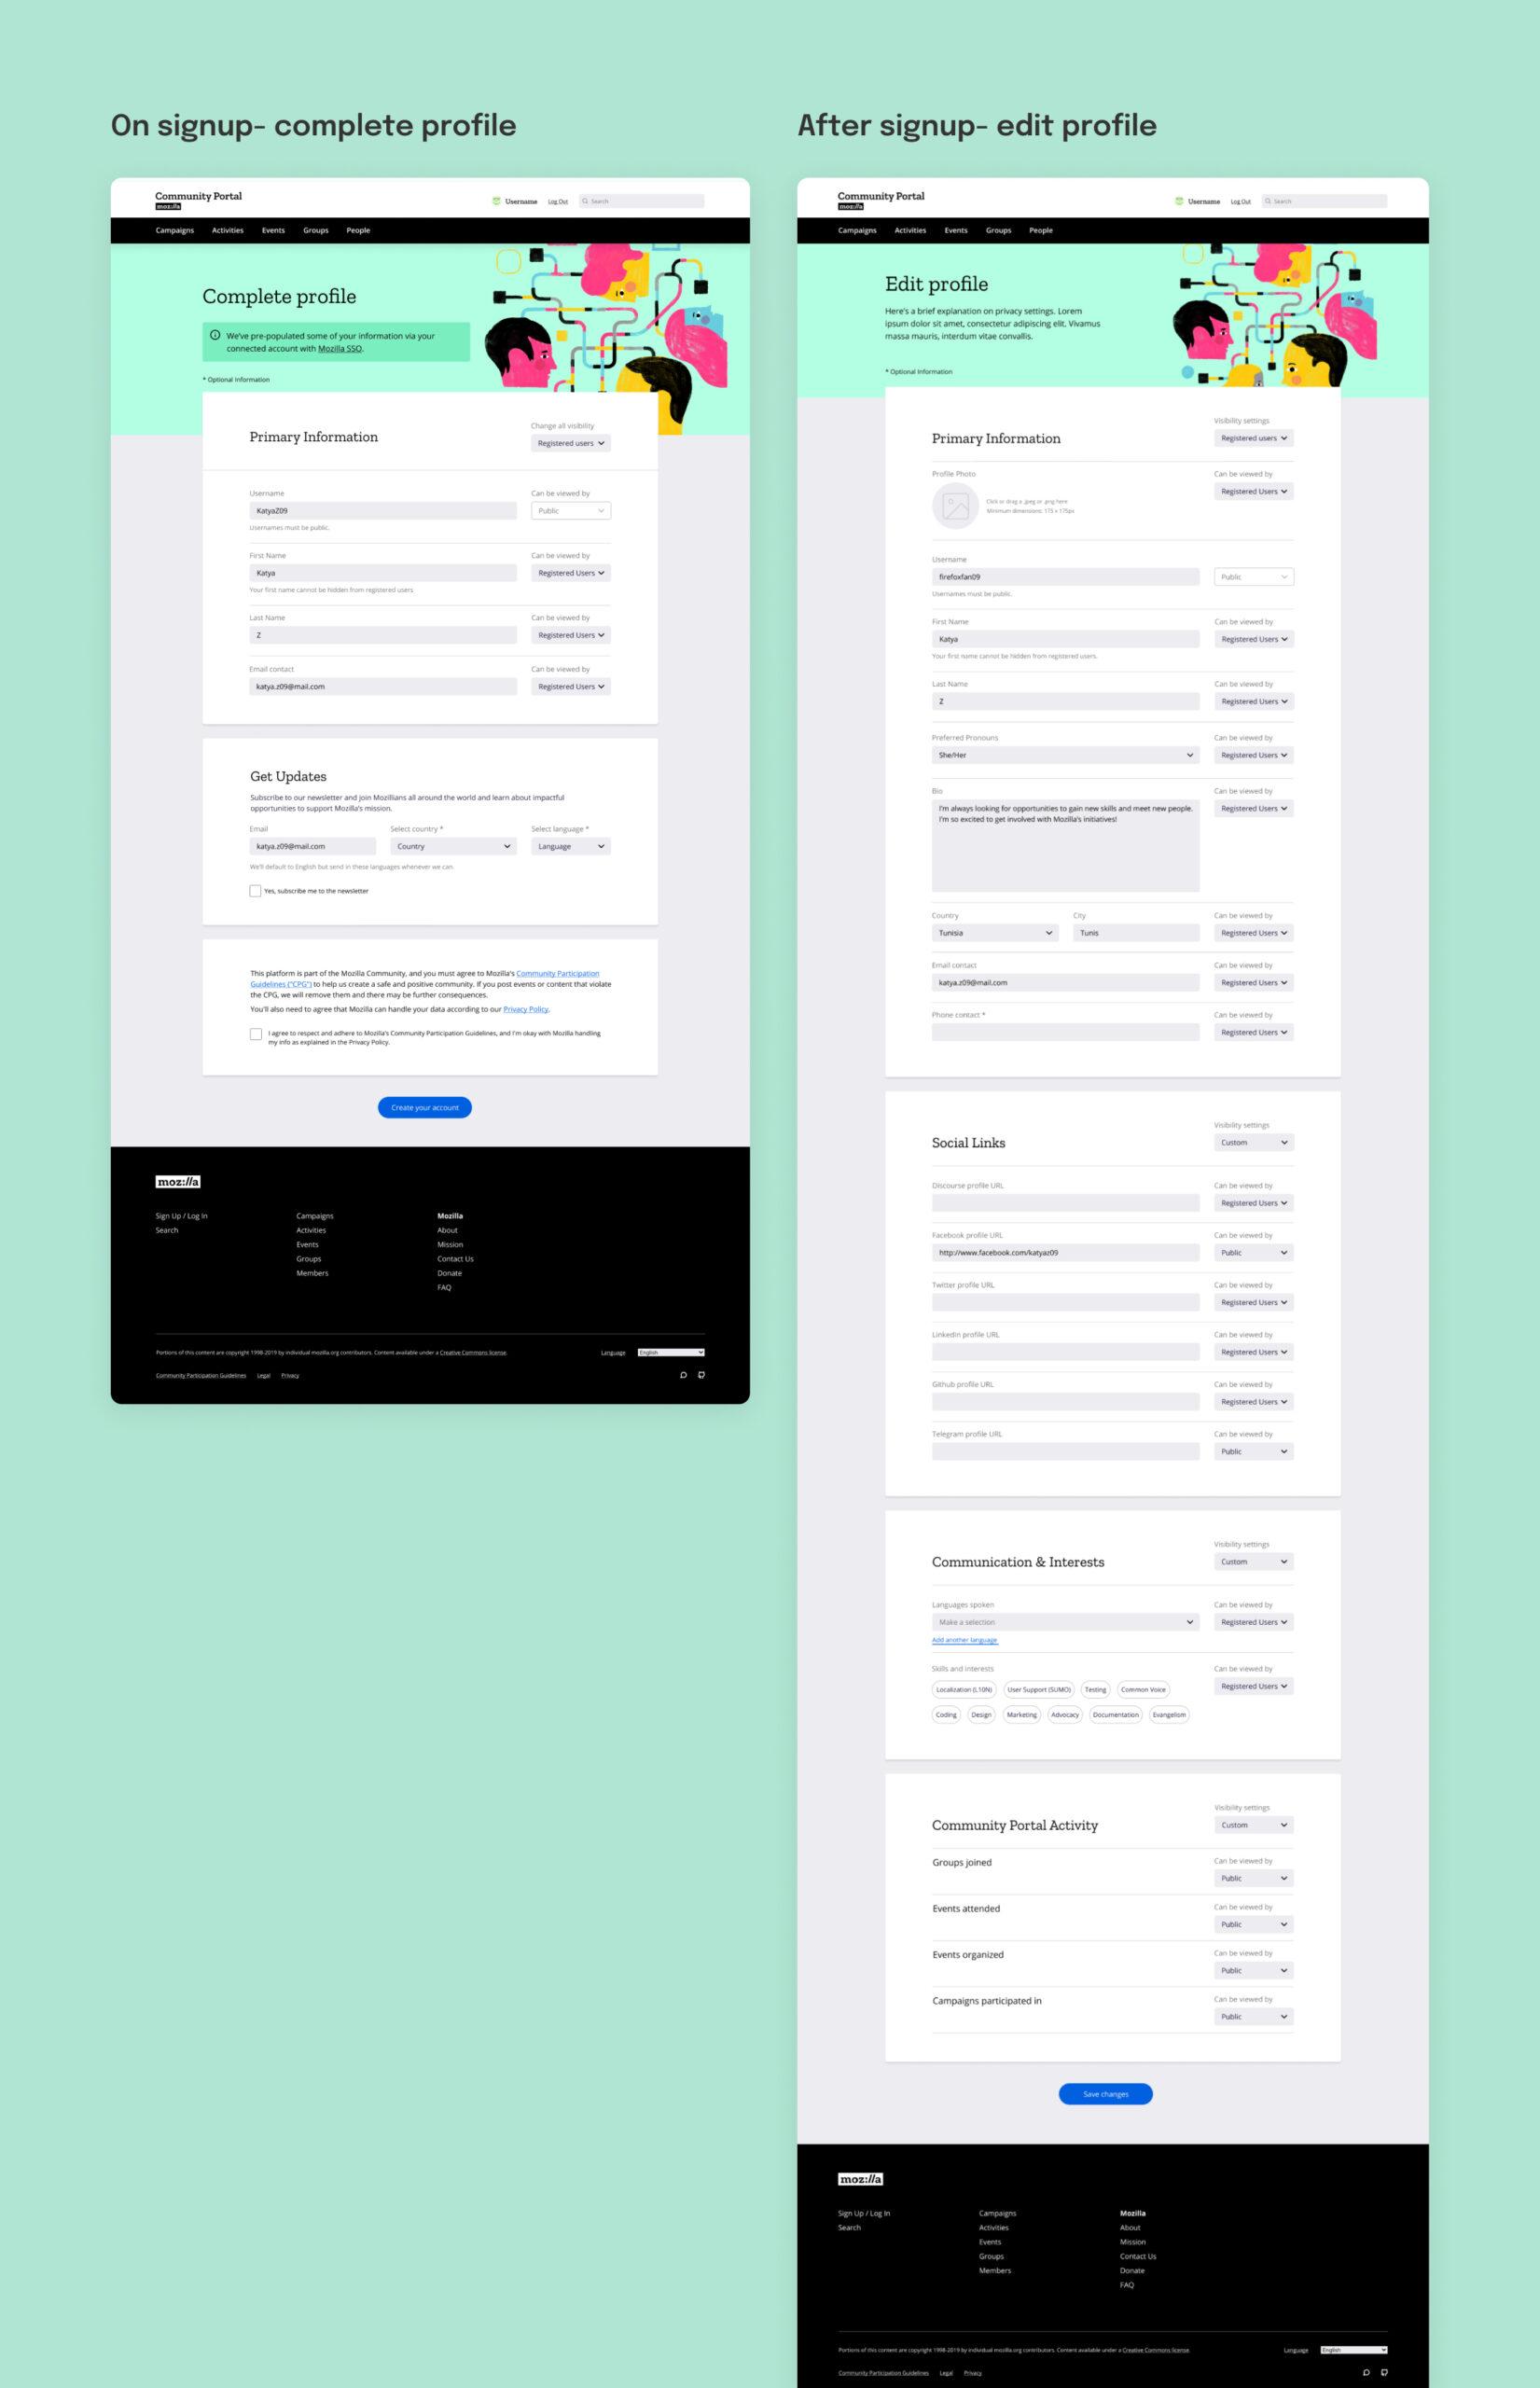 the Complete Profile screen alongside the Edit Profile screen